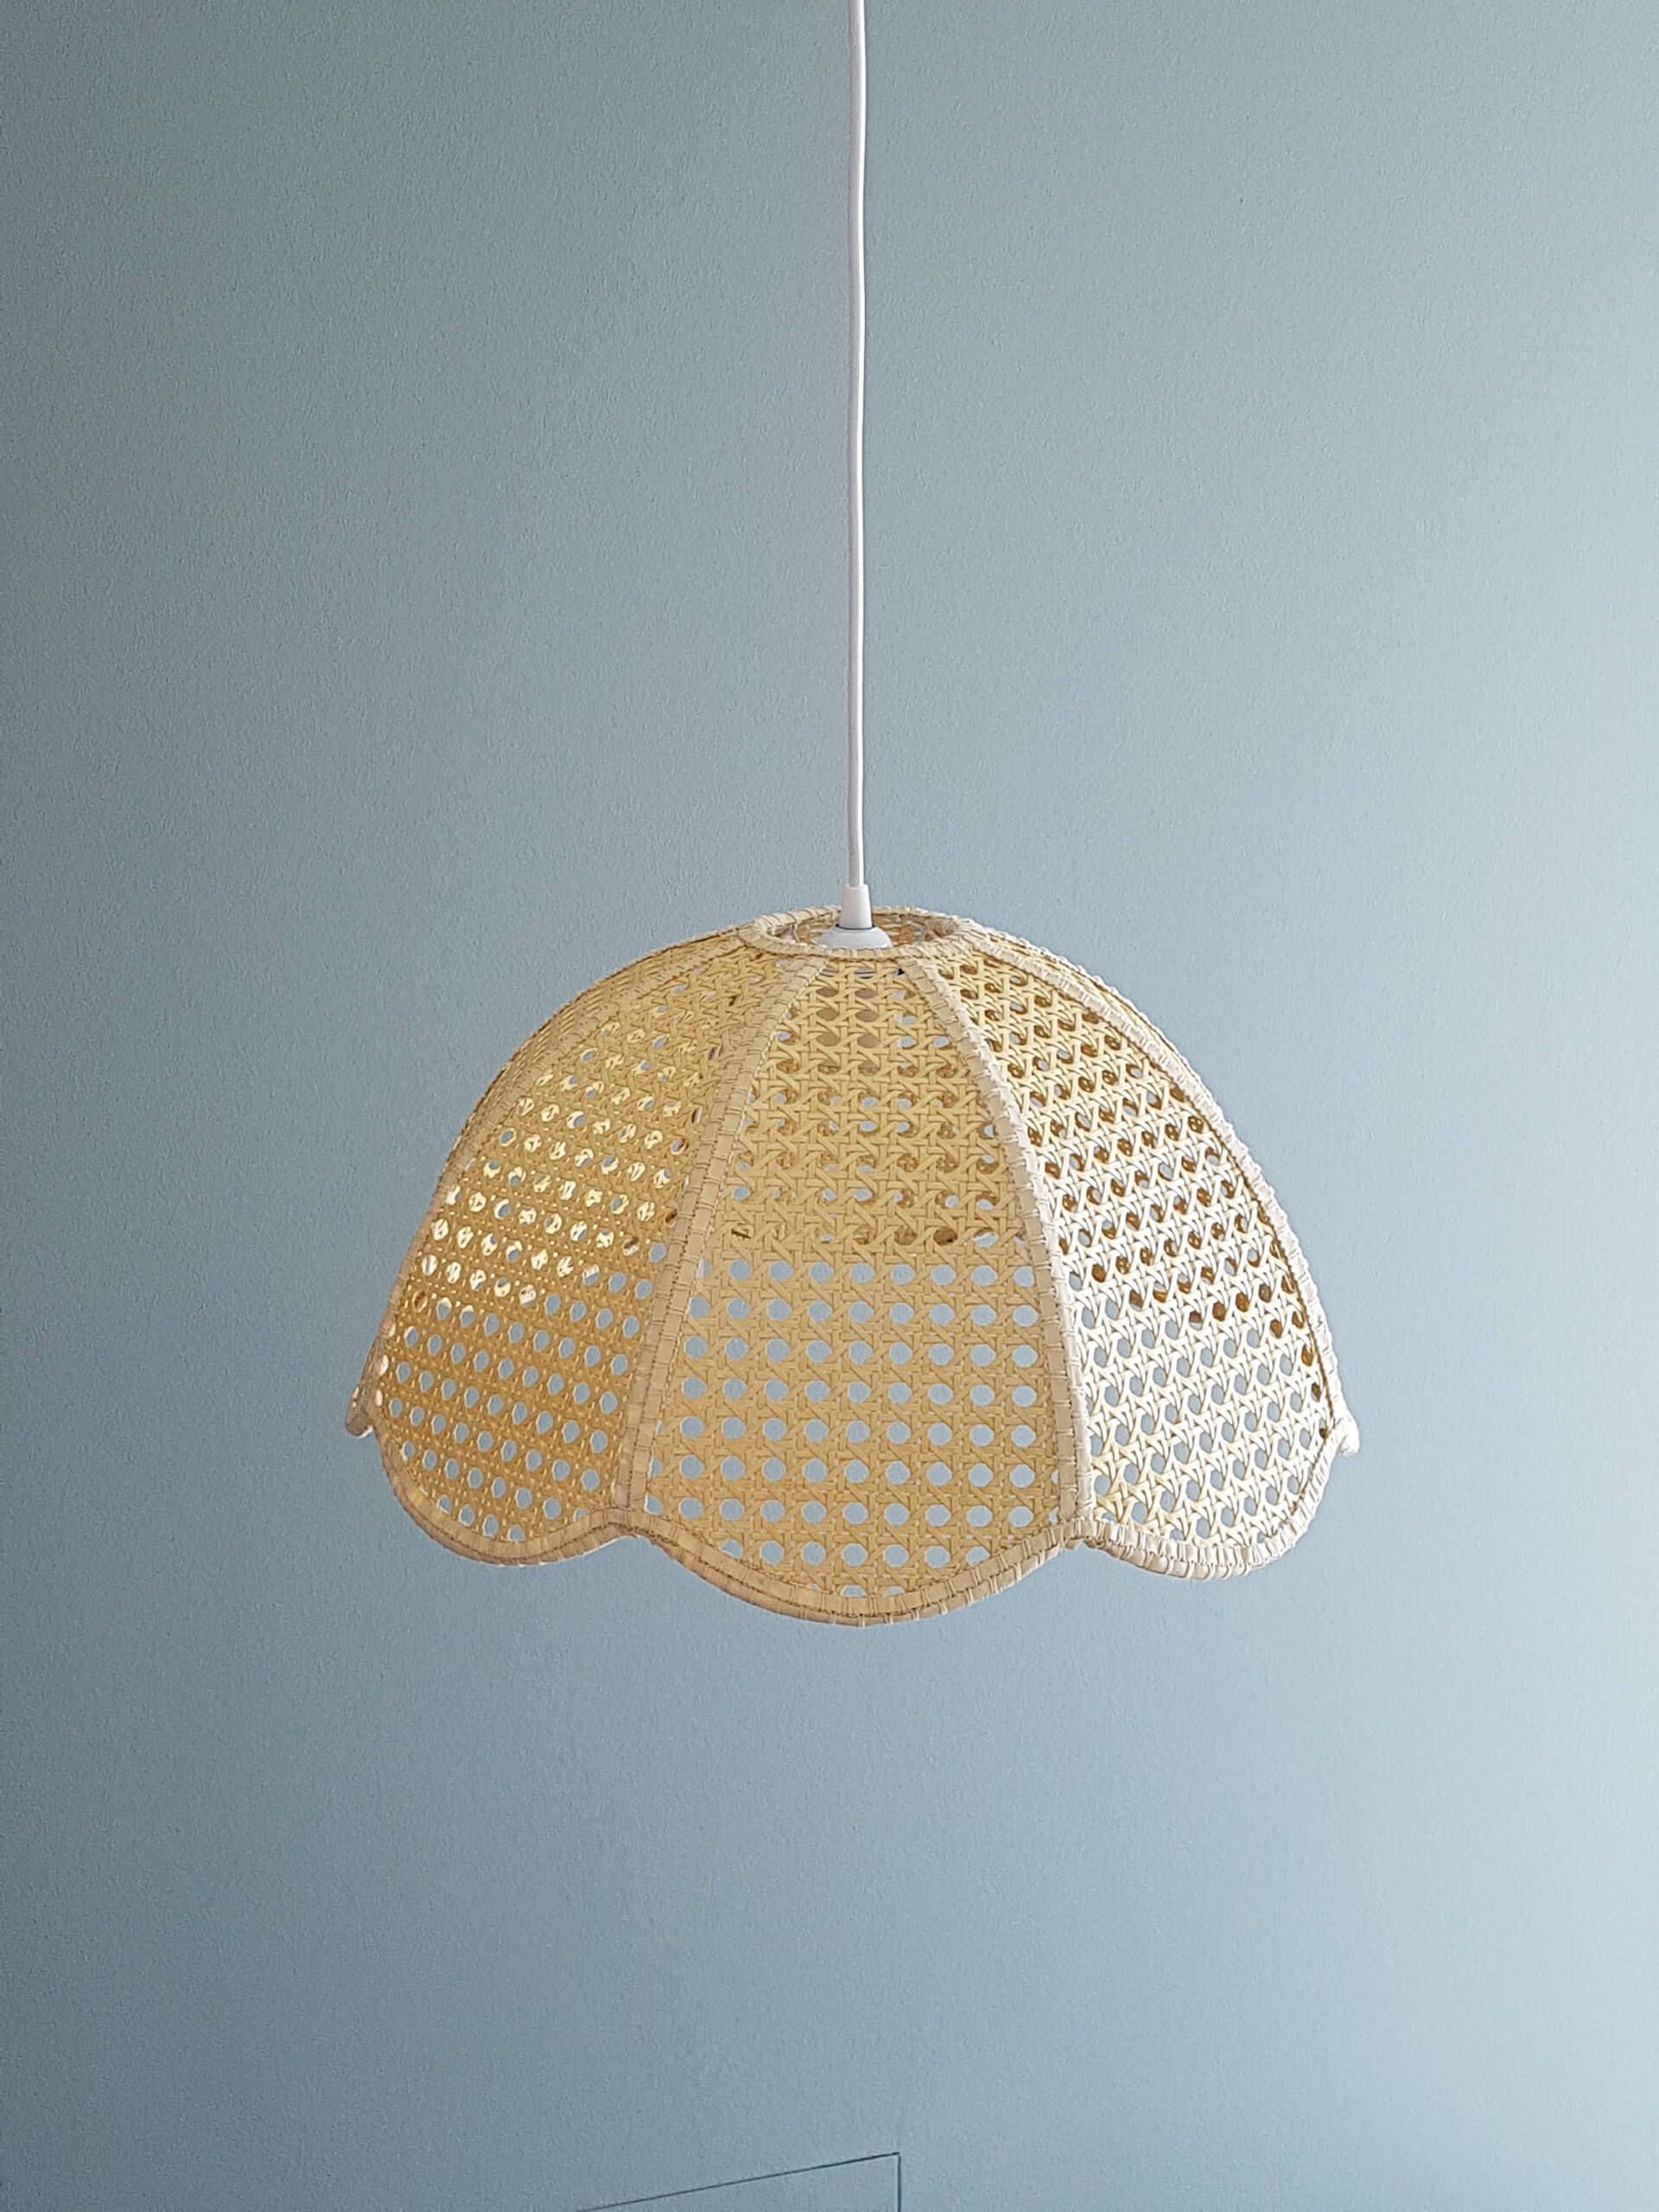 Rattan Home Decor Vintage Venetian Braid Lamp Shade From Etsy Nonagon Style Lampshadechandelier